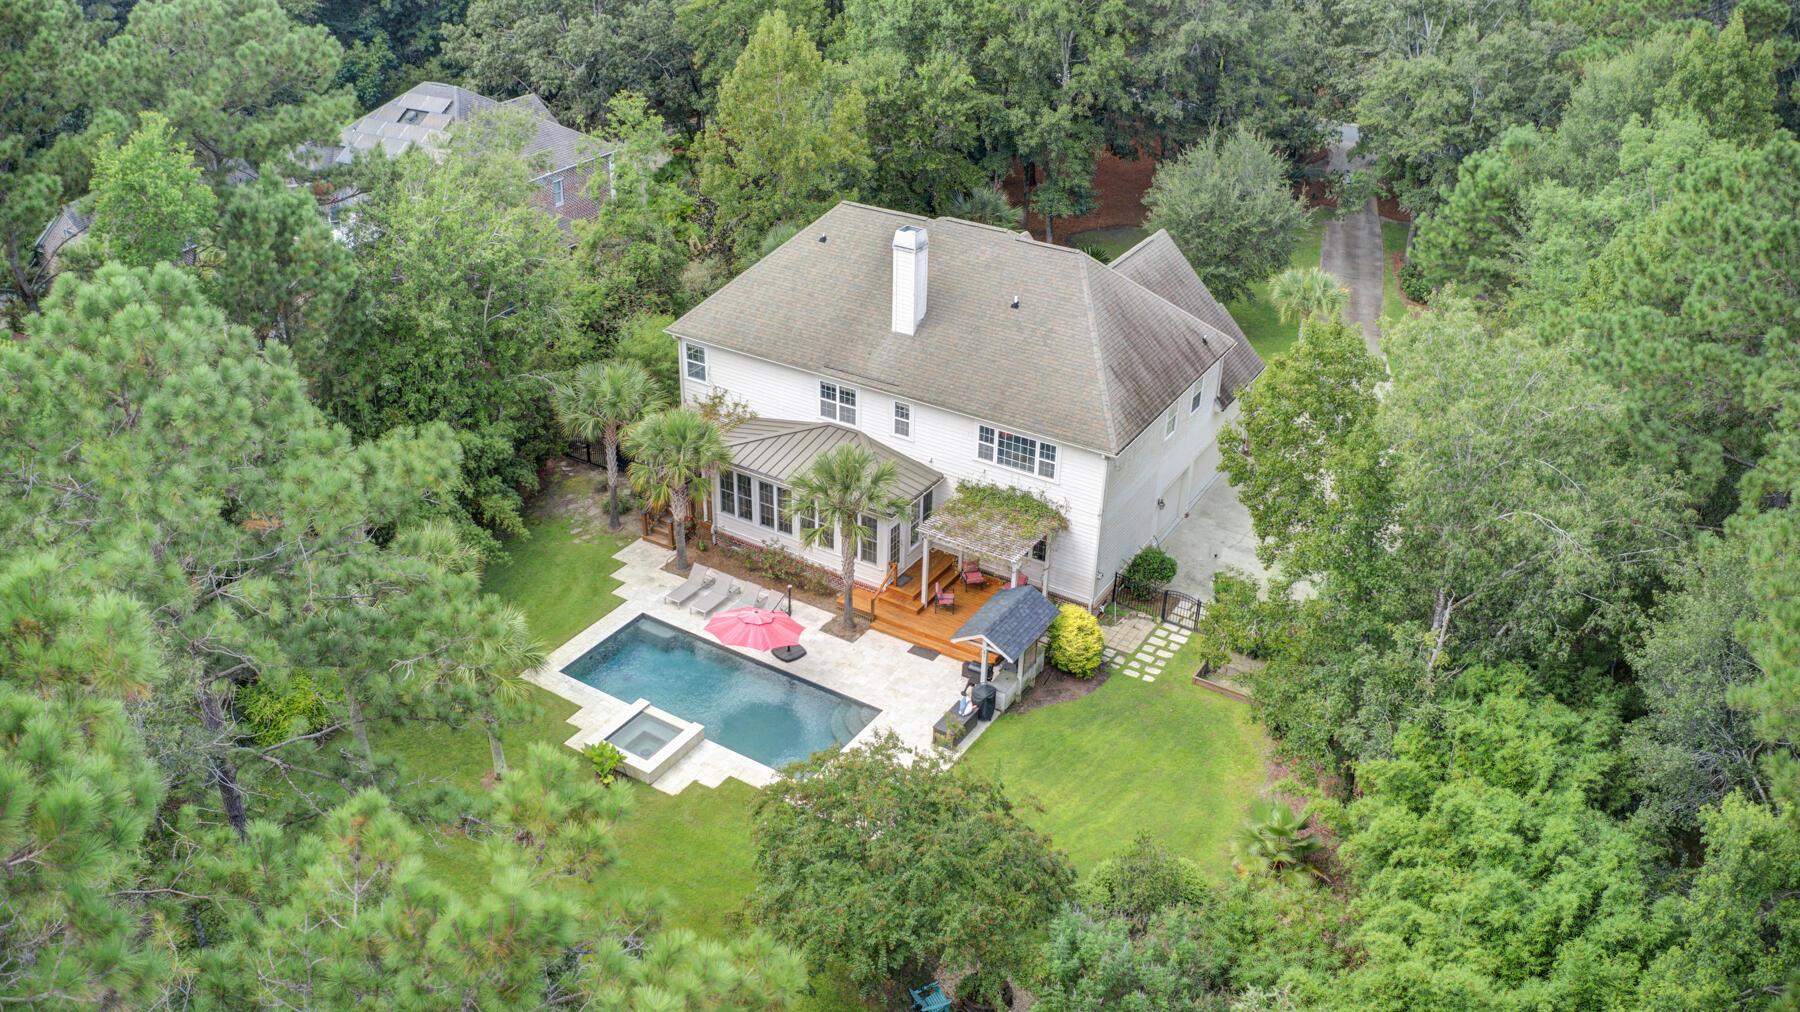 Dunes West Homes For Sale - 3095 Pignatelli, Mount Pleasant, SC - 62